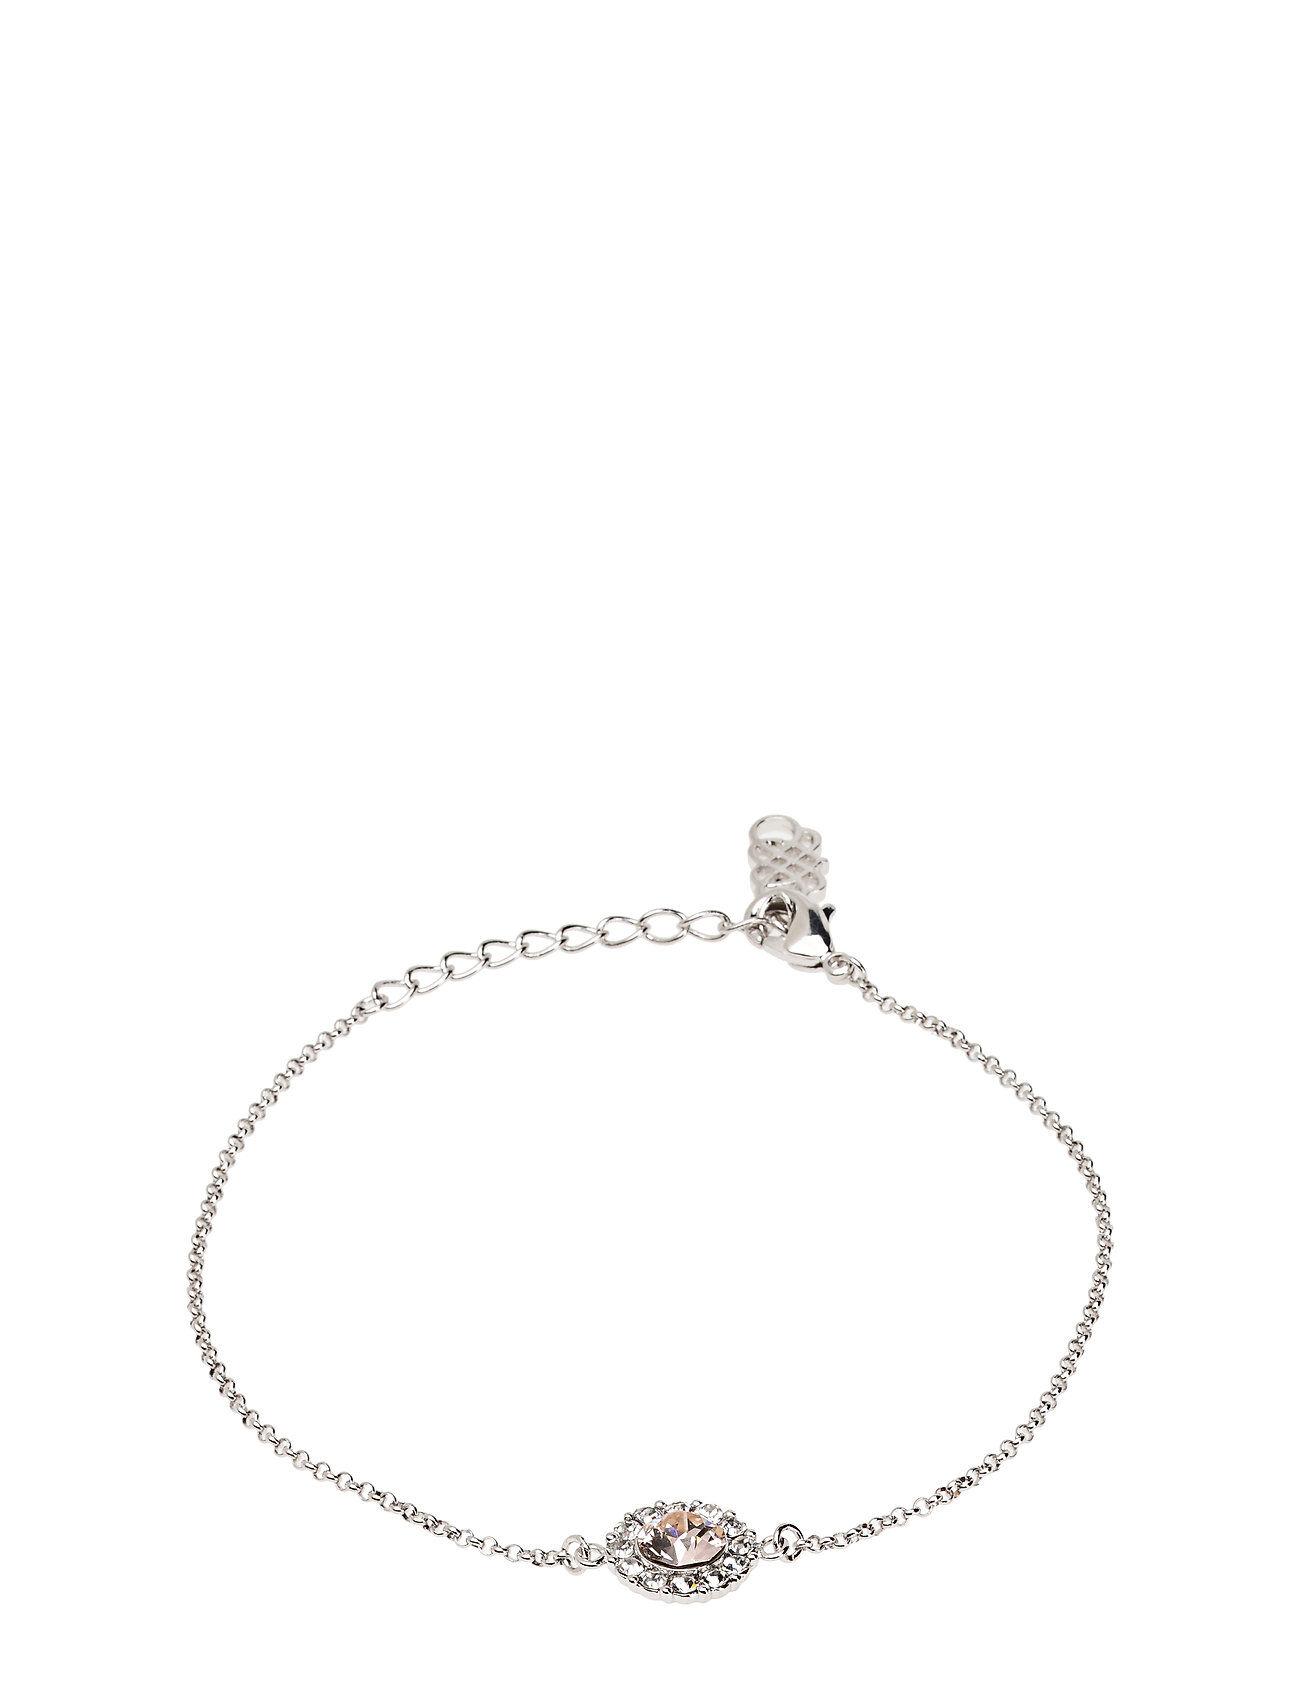 LILY AND ROSE Celeste Bracelet - Silk Accessories Jewellery Bracelets Chain Bracelets Beige LILY AND ROSE